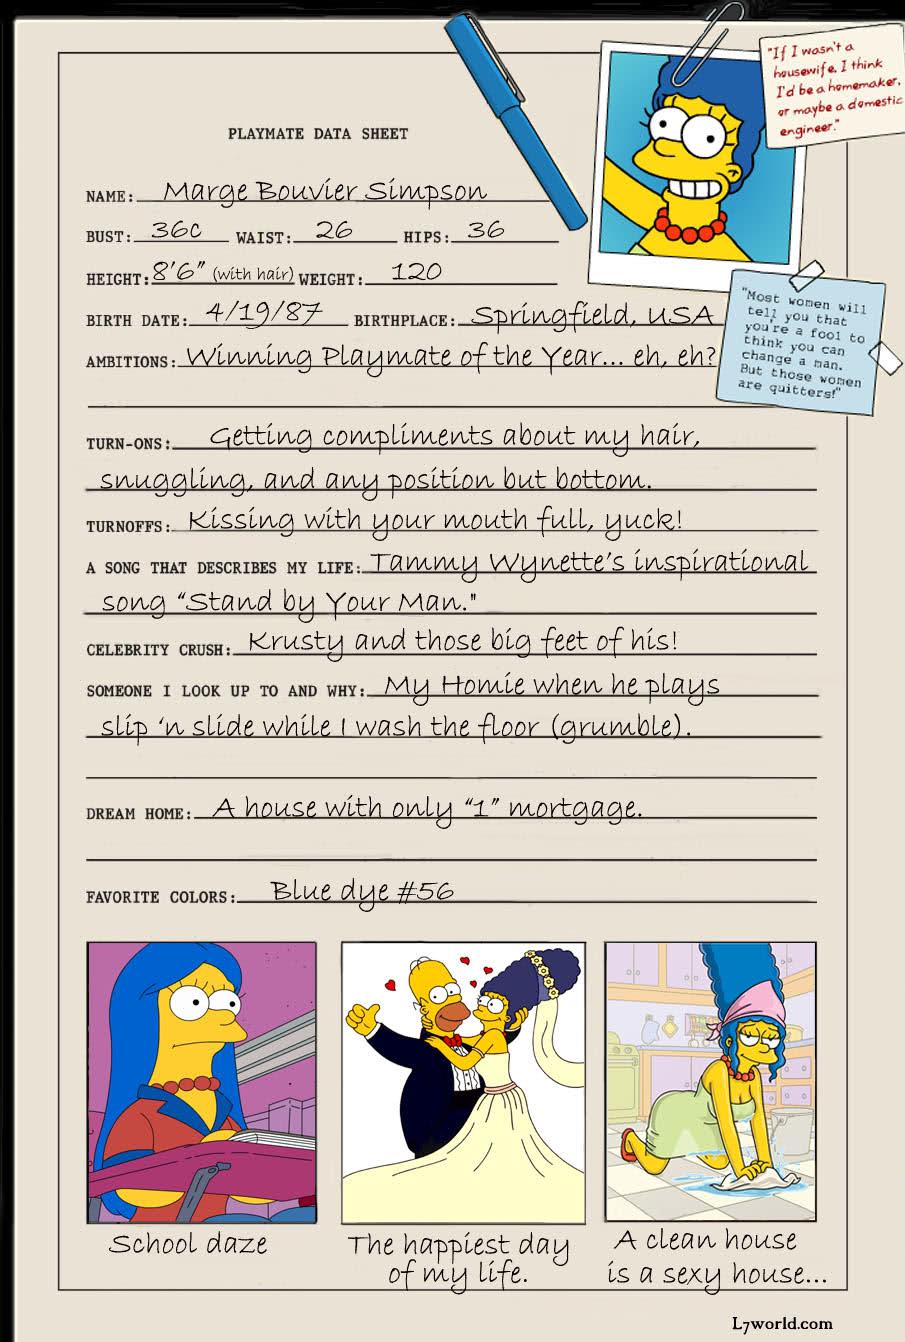 Marge Simpson Playboy Playmate Data Sheet